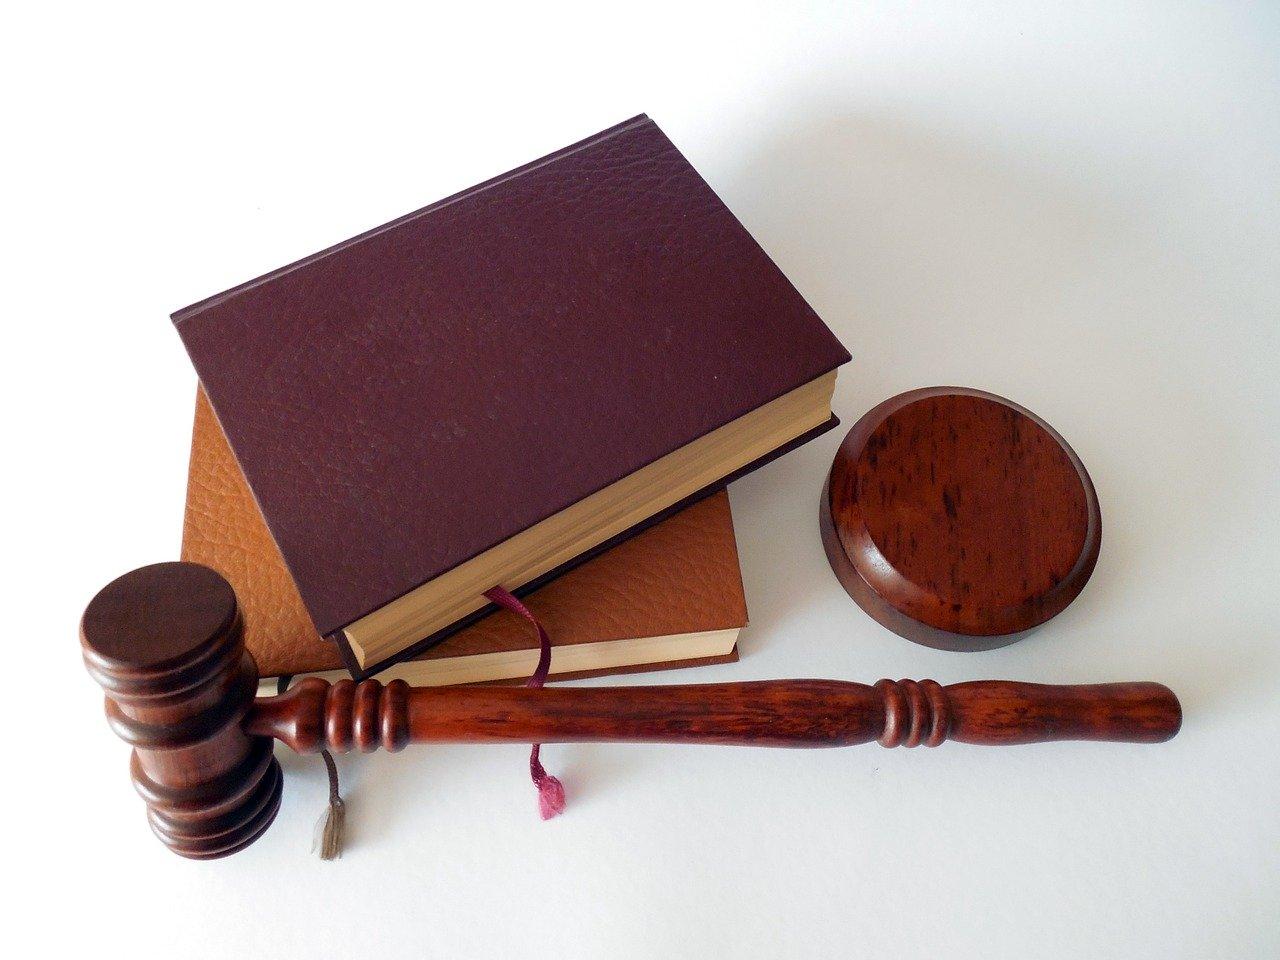 'It just devastated me': Florida law grads left hanging after bar exam called off